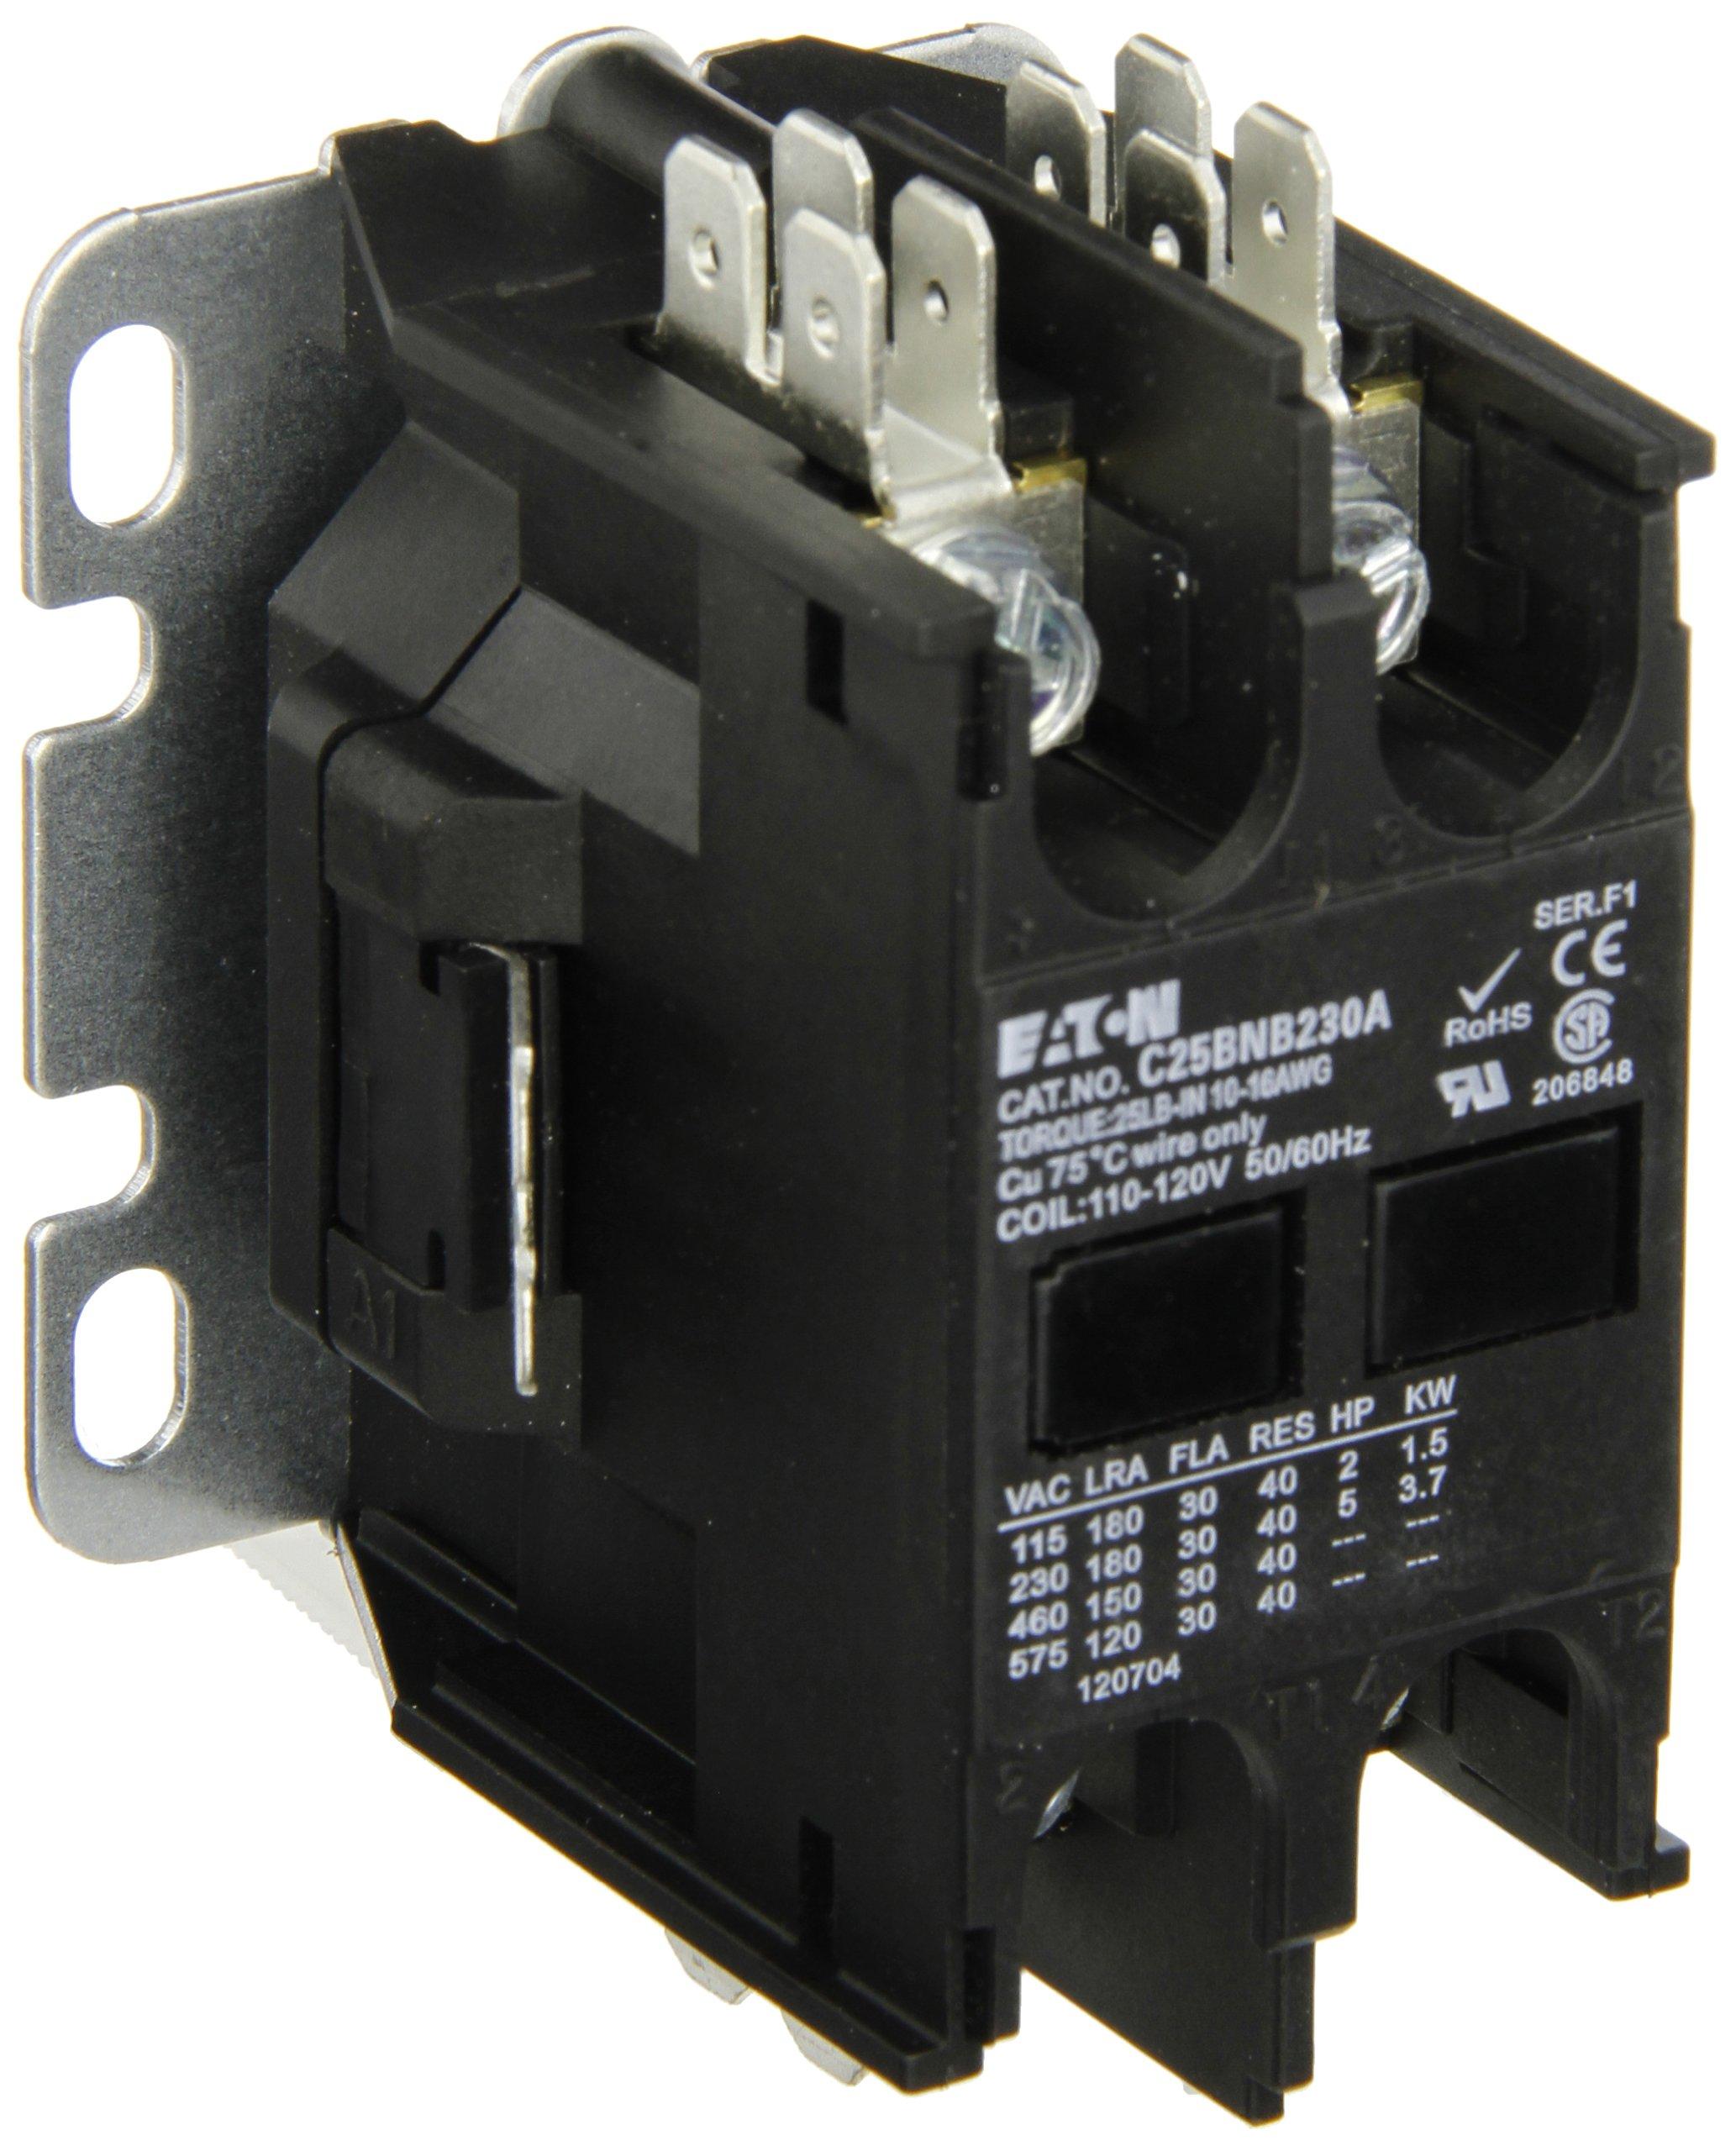 Eaton C25bnb230a Compact Definite Purpose Contactor 30a Inductive Current Relay Rating 2 Max Hp At 115v 5 230v 120vac Coil Voltage